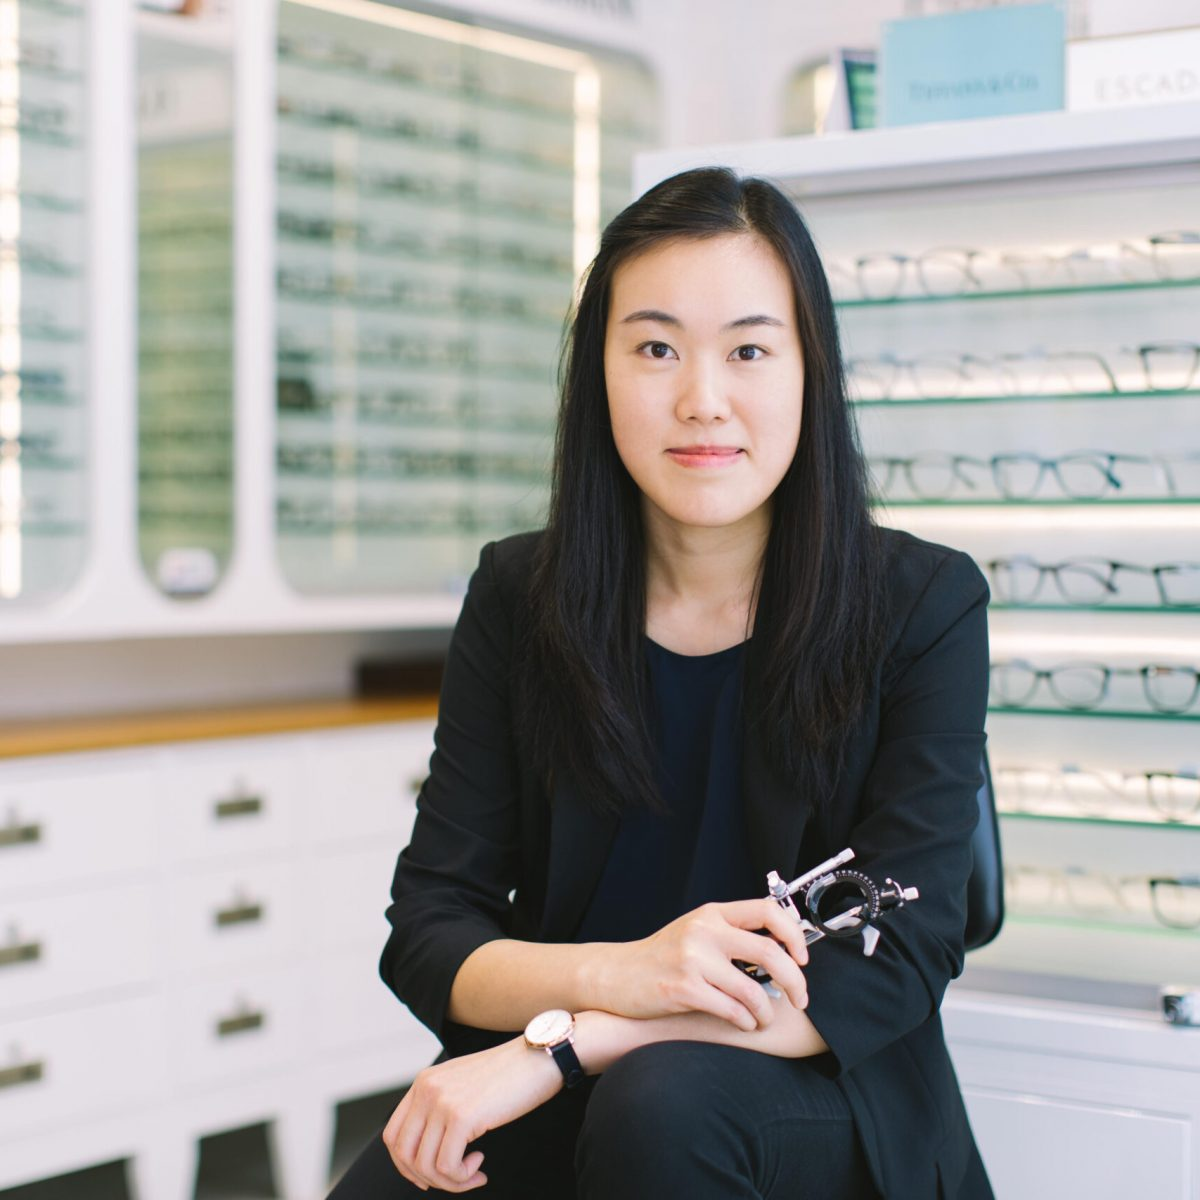 Dr. Sylvia Chau optometrist holding a trial frame